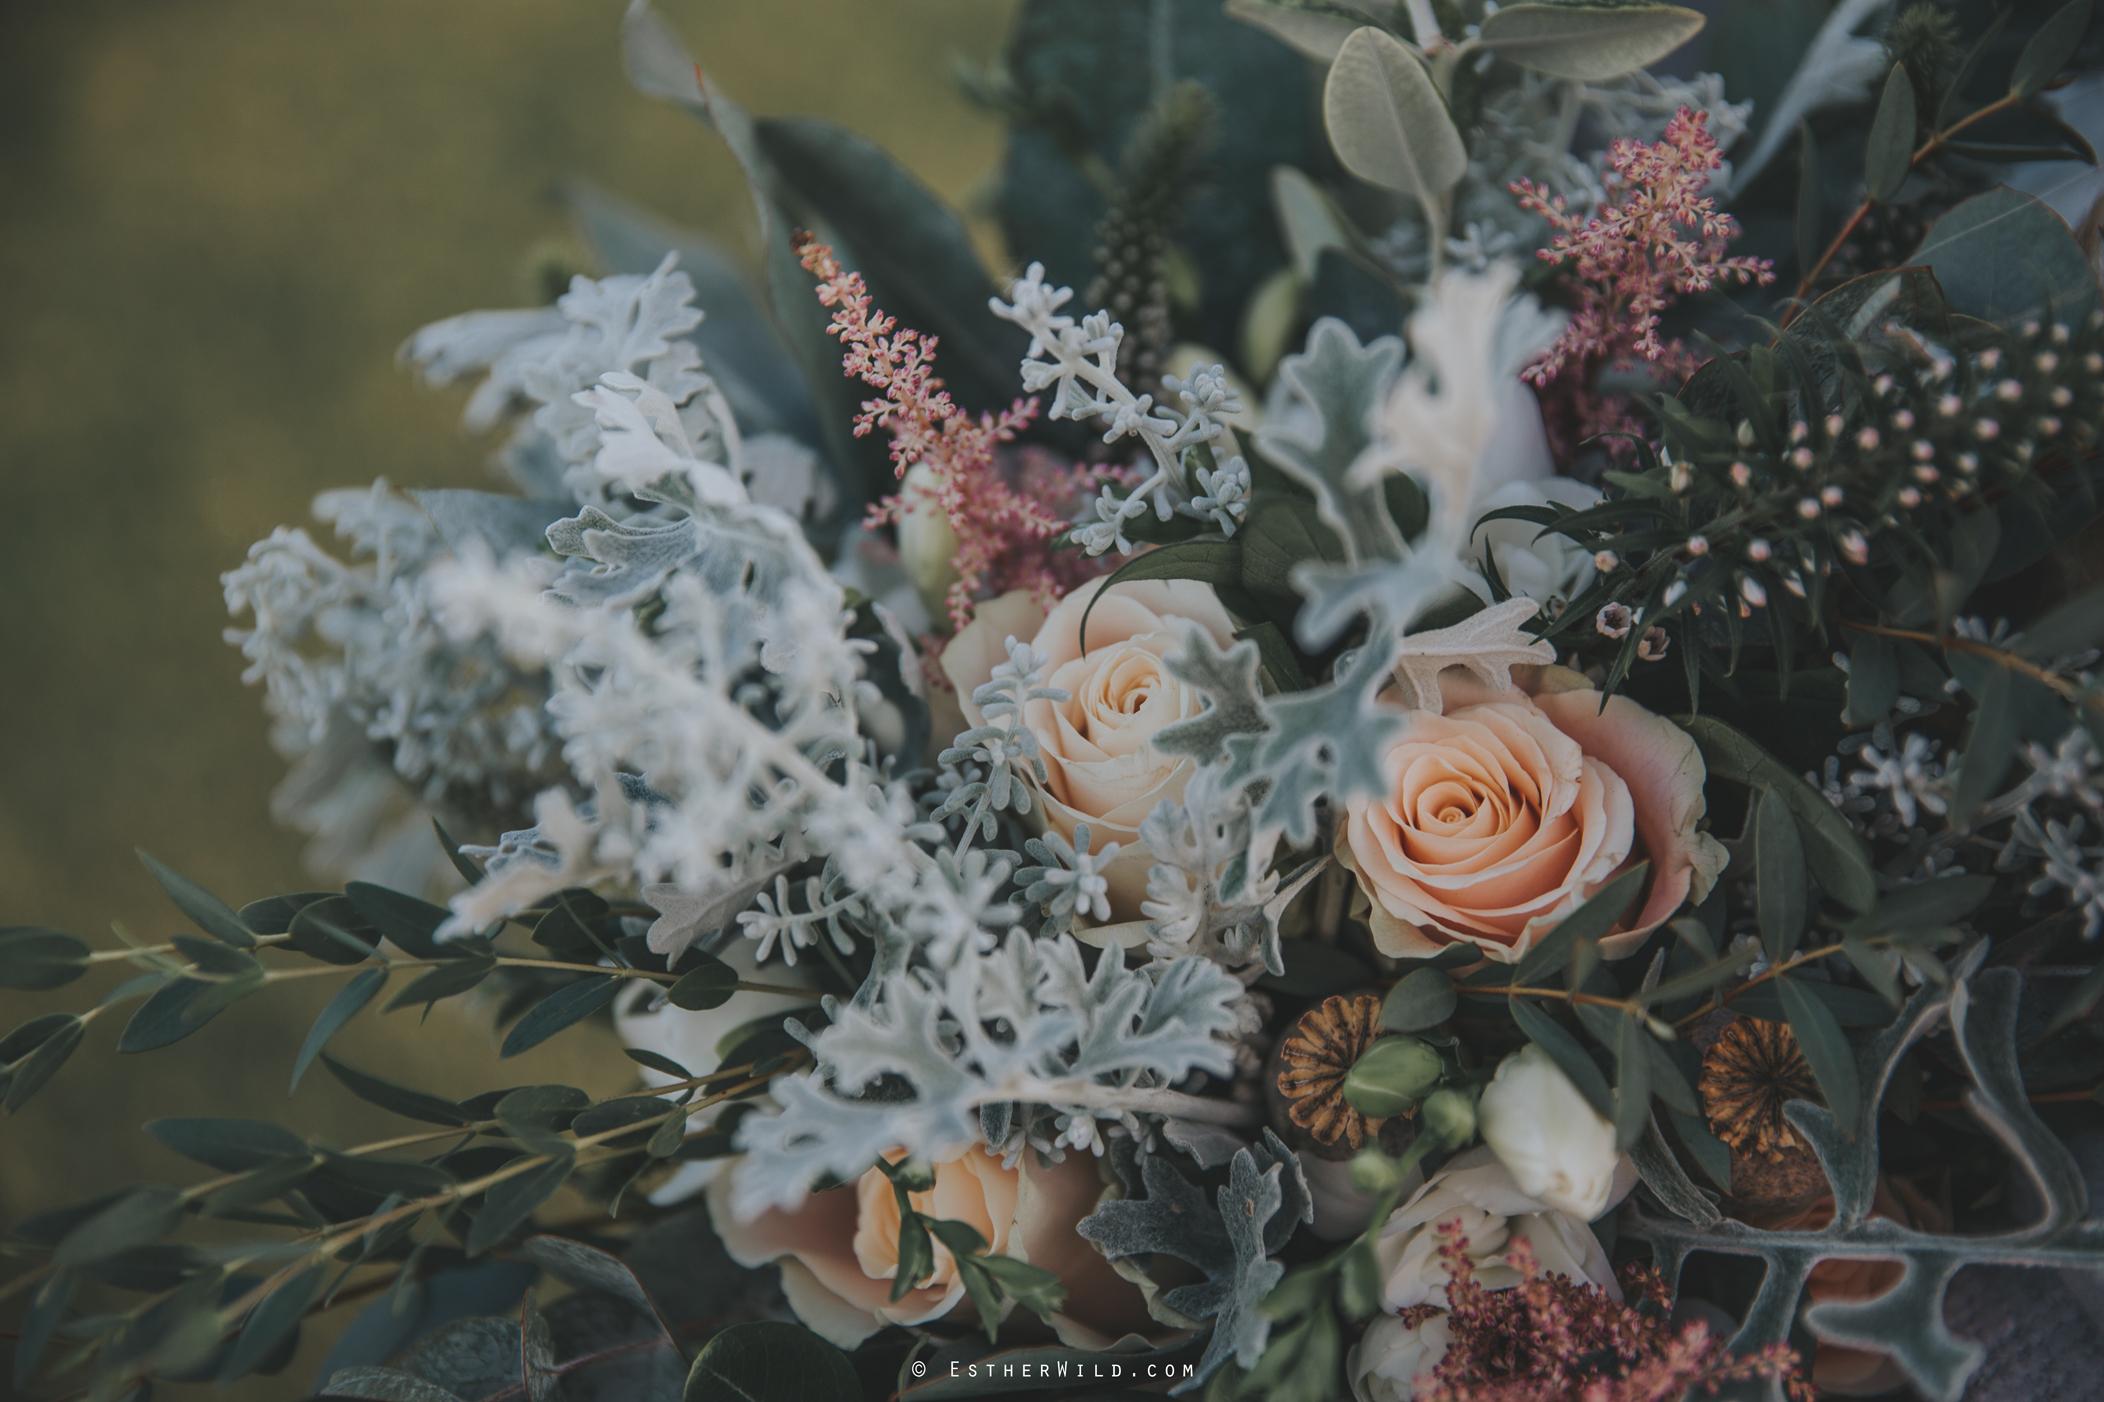 Couple_Anniversary_Wedding_Photography_Hunstanton_Norfolk_Esther_Wild_Share_Copy_IMG_9042.jpg